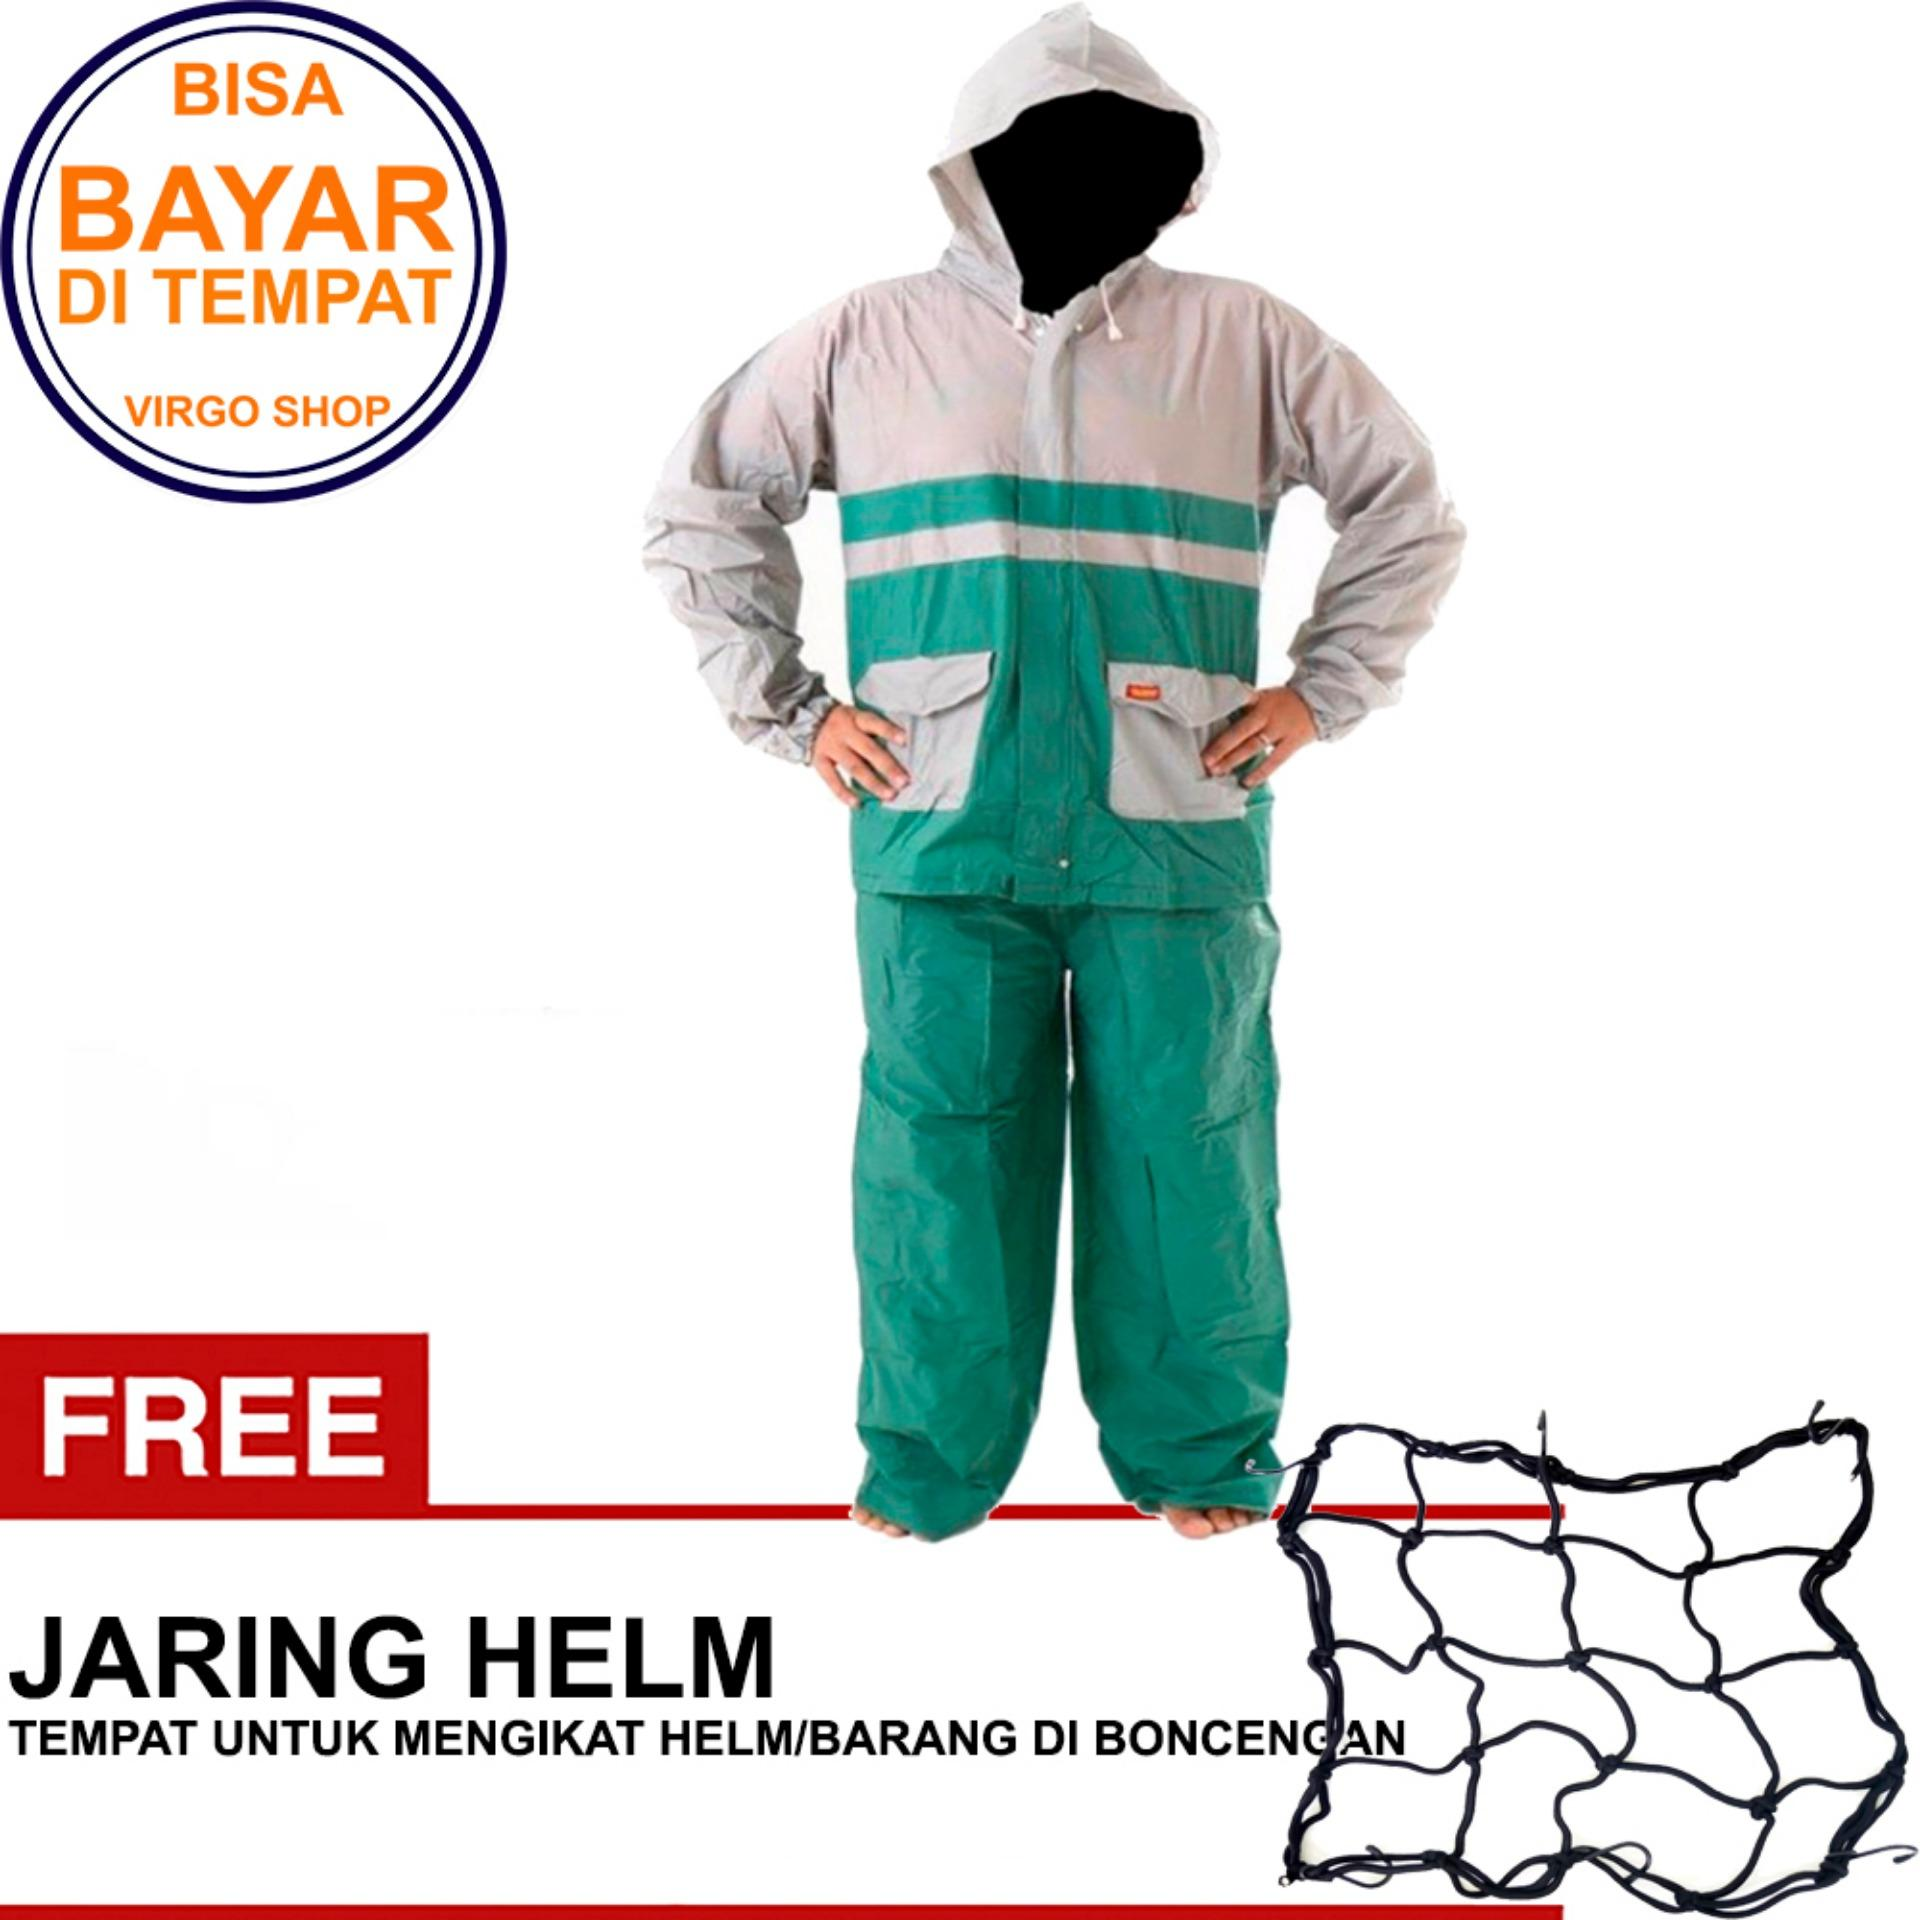 Termurah Elmondo Jas Hujan Setelan Baju Celana - New Kombinasi Tipe 905 Hijau Bonus Jaring Helm HITAM